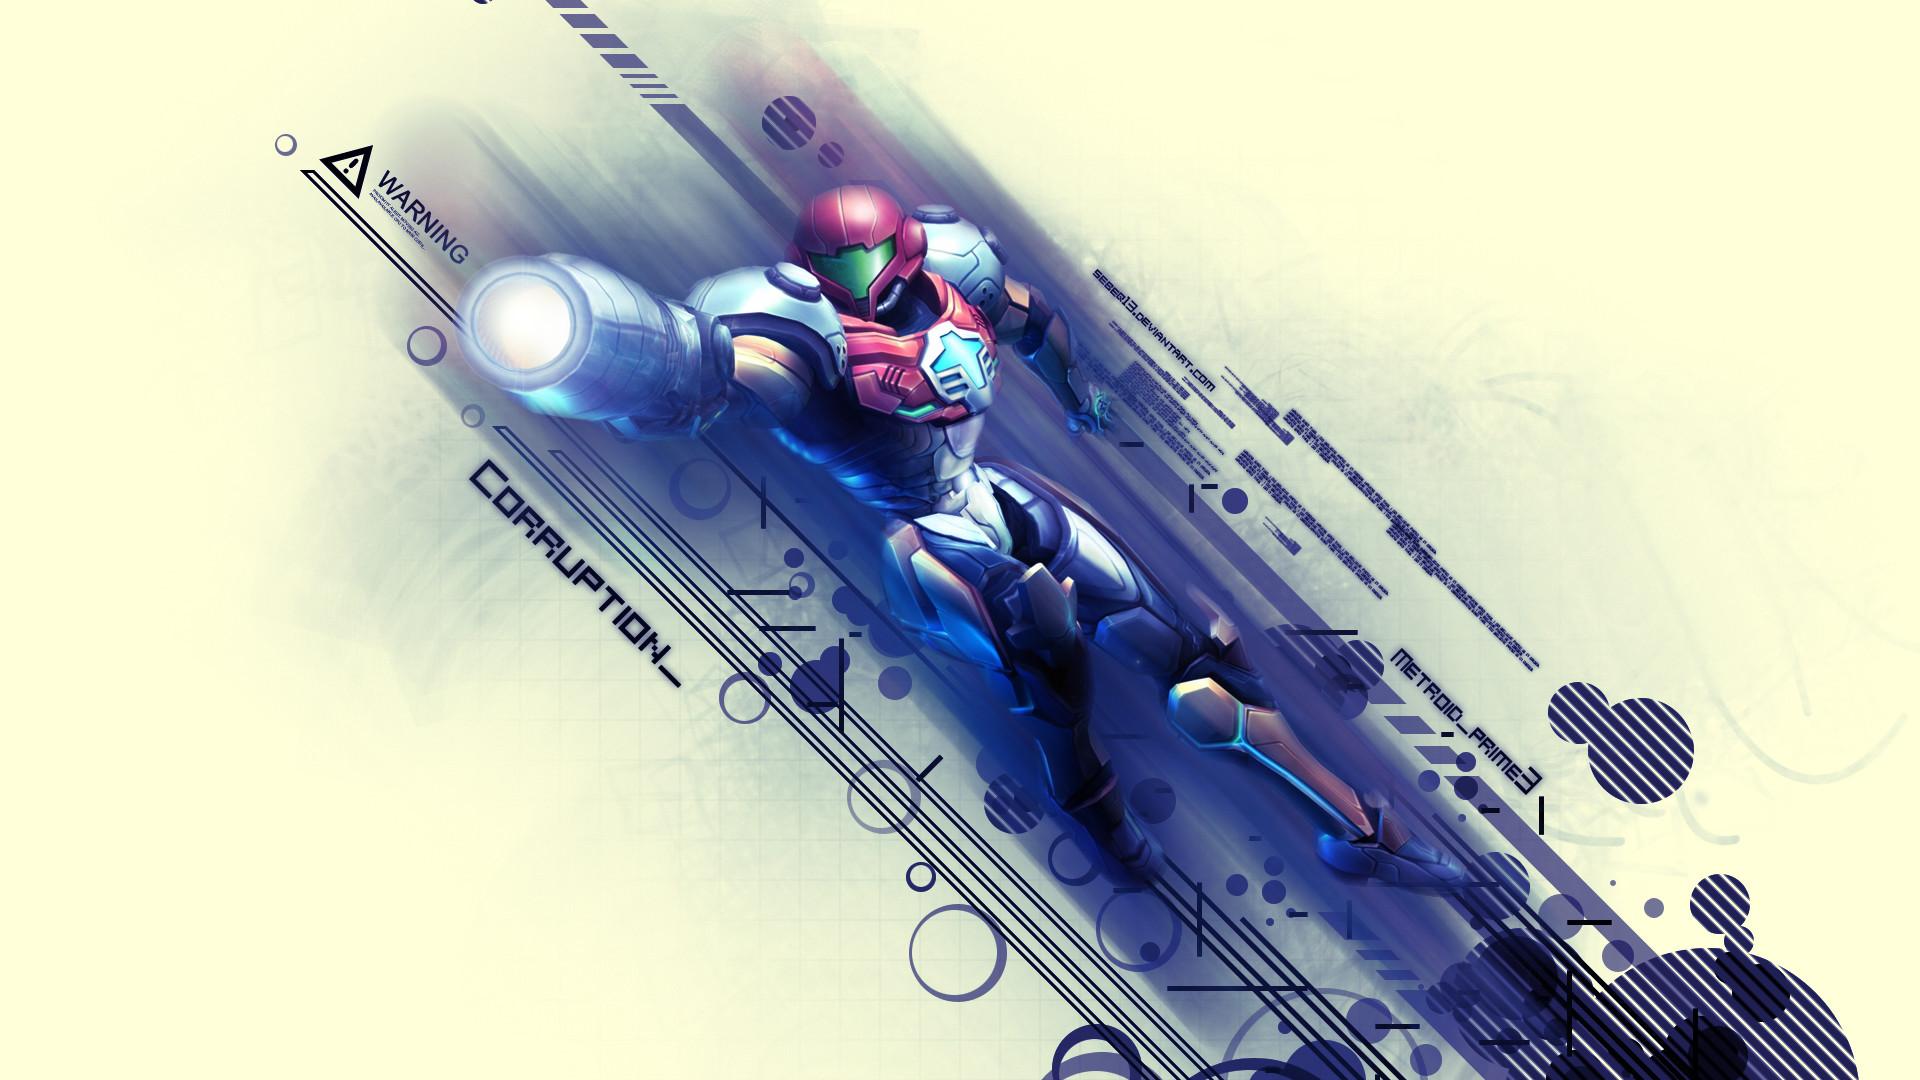 Metroid Prime 3 wallpaper by sEbeQ13 Metroid Prime 3 wallpaper by sEbeQ13